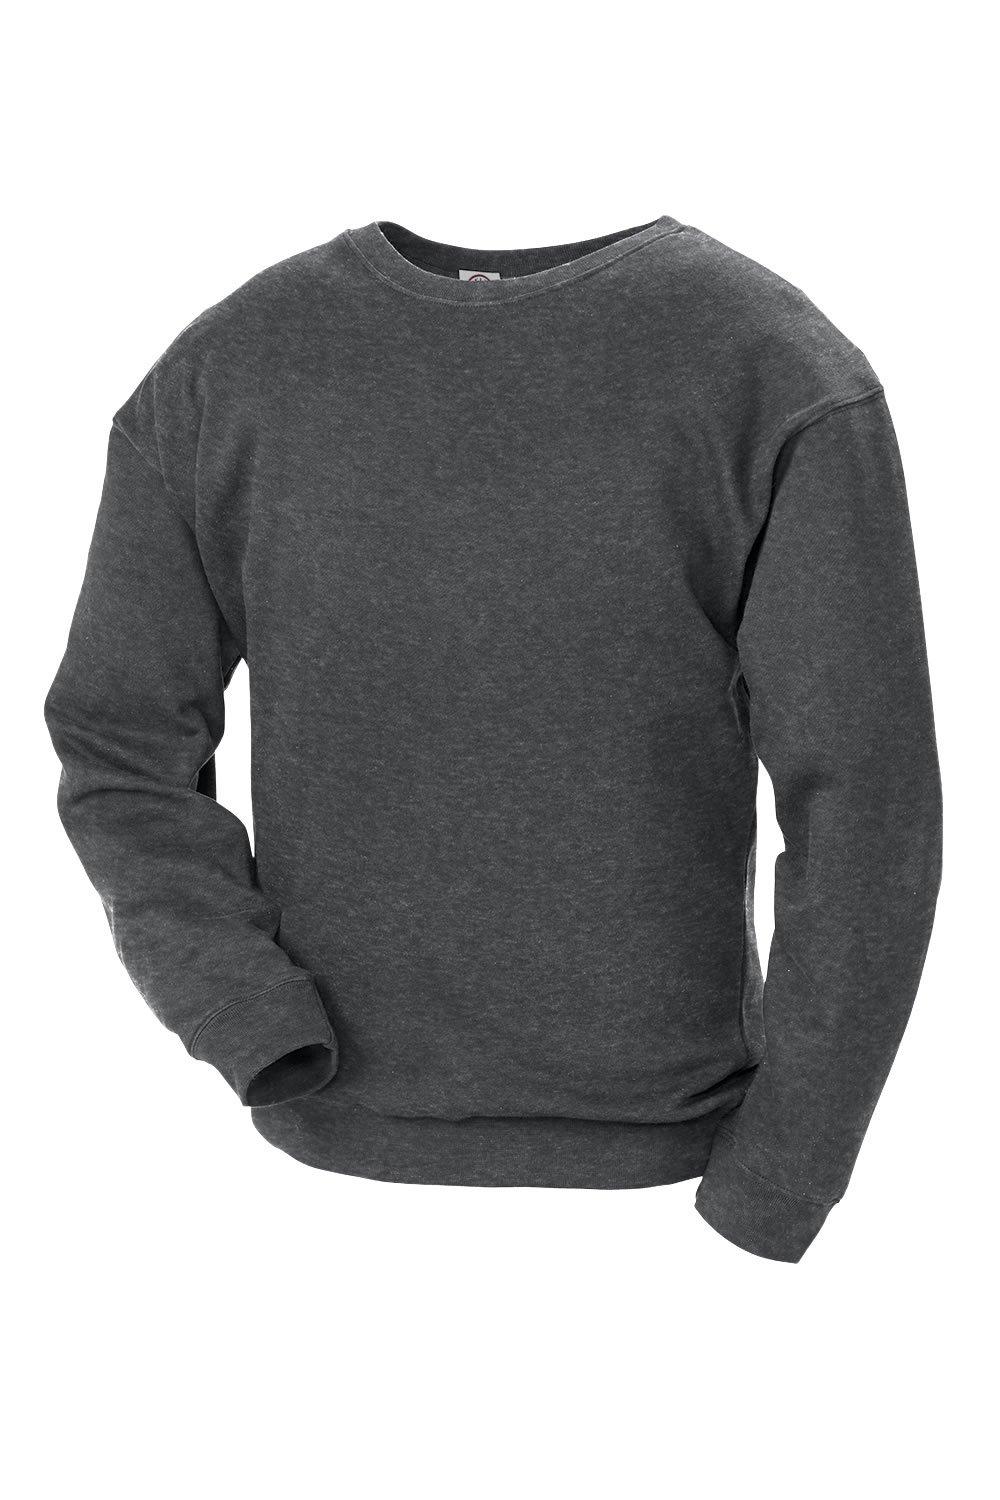 Sweatshirts/Hoodies - AU Availability